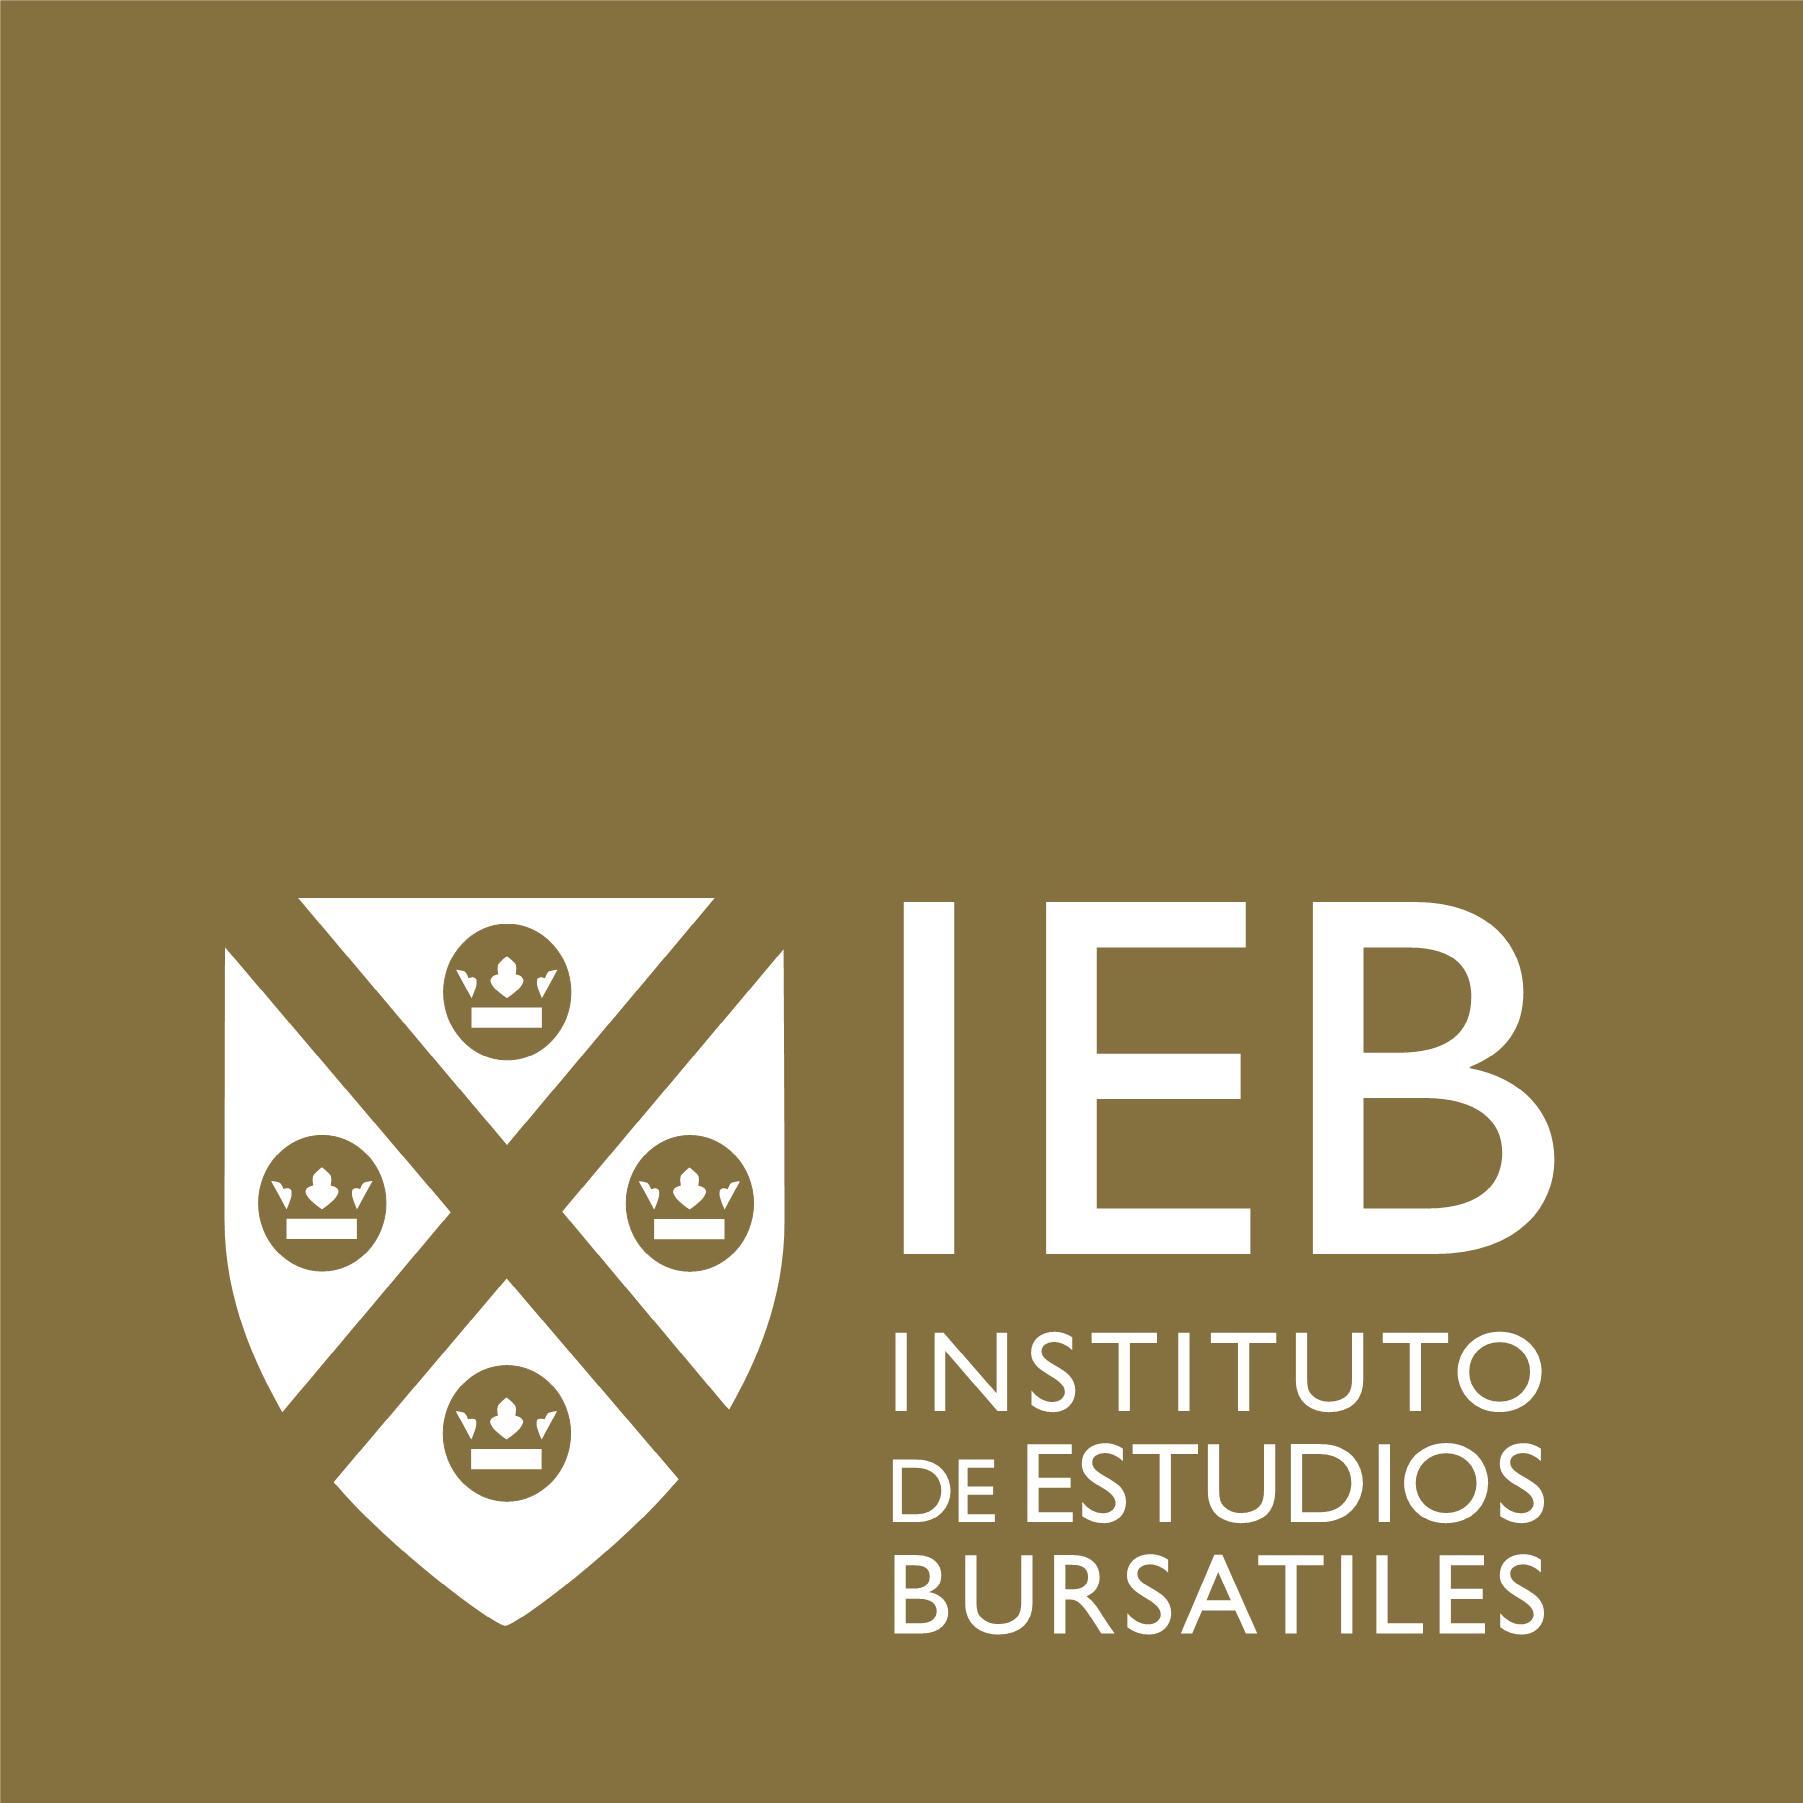 Instituto de Estudios Bursátiles